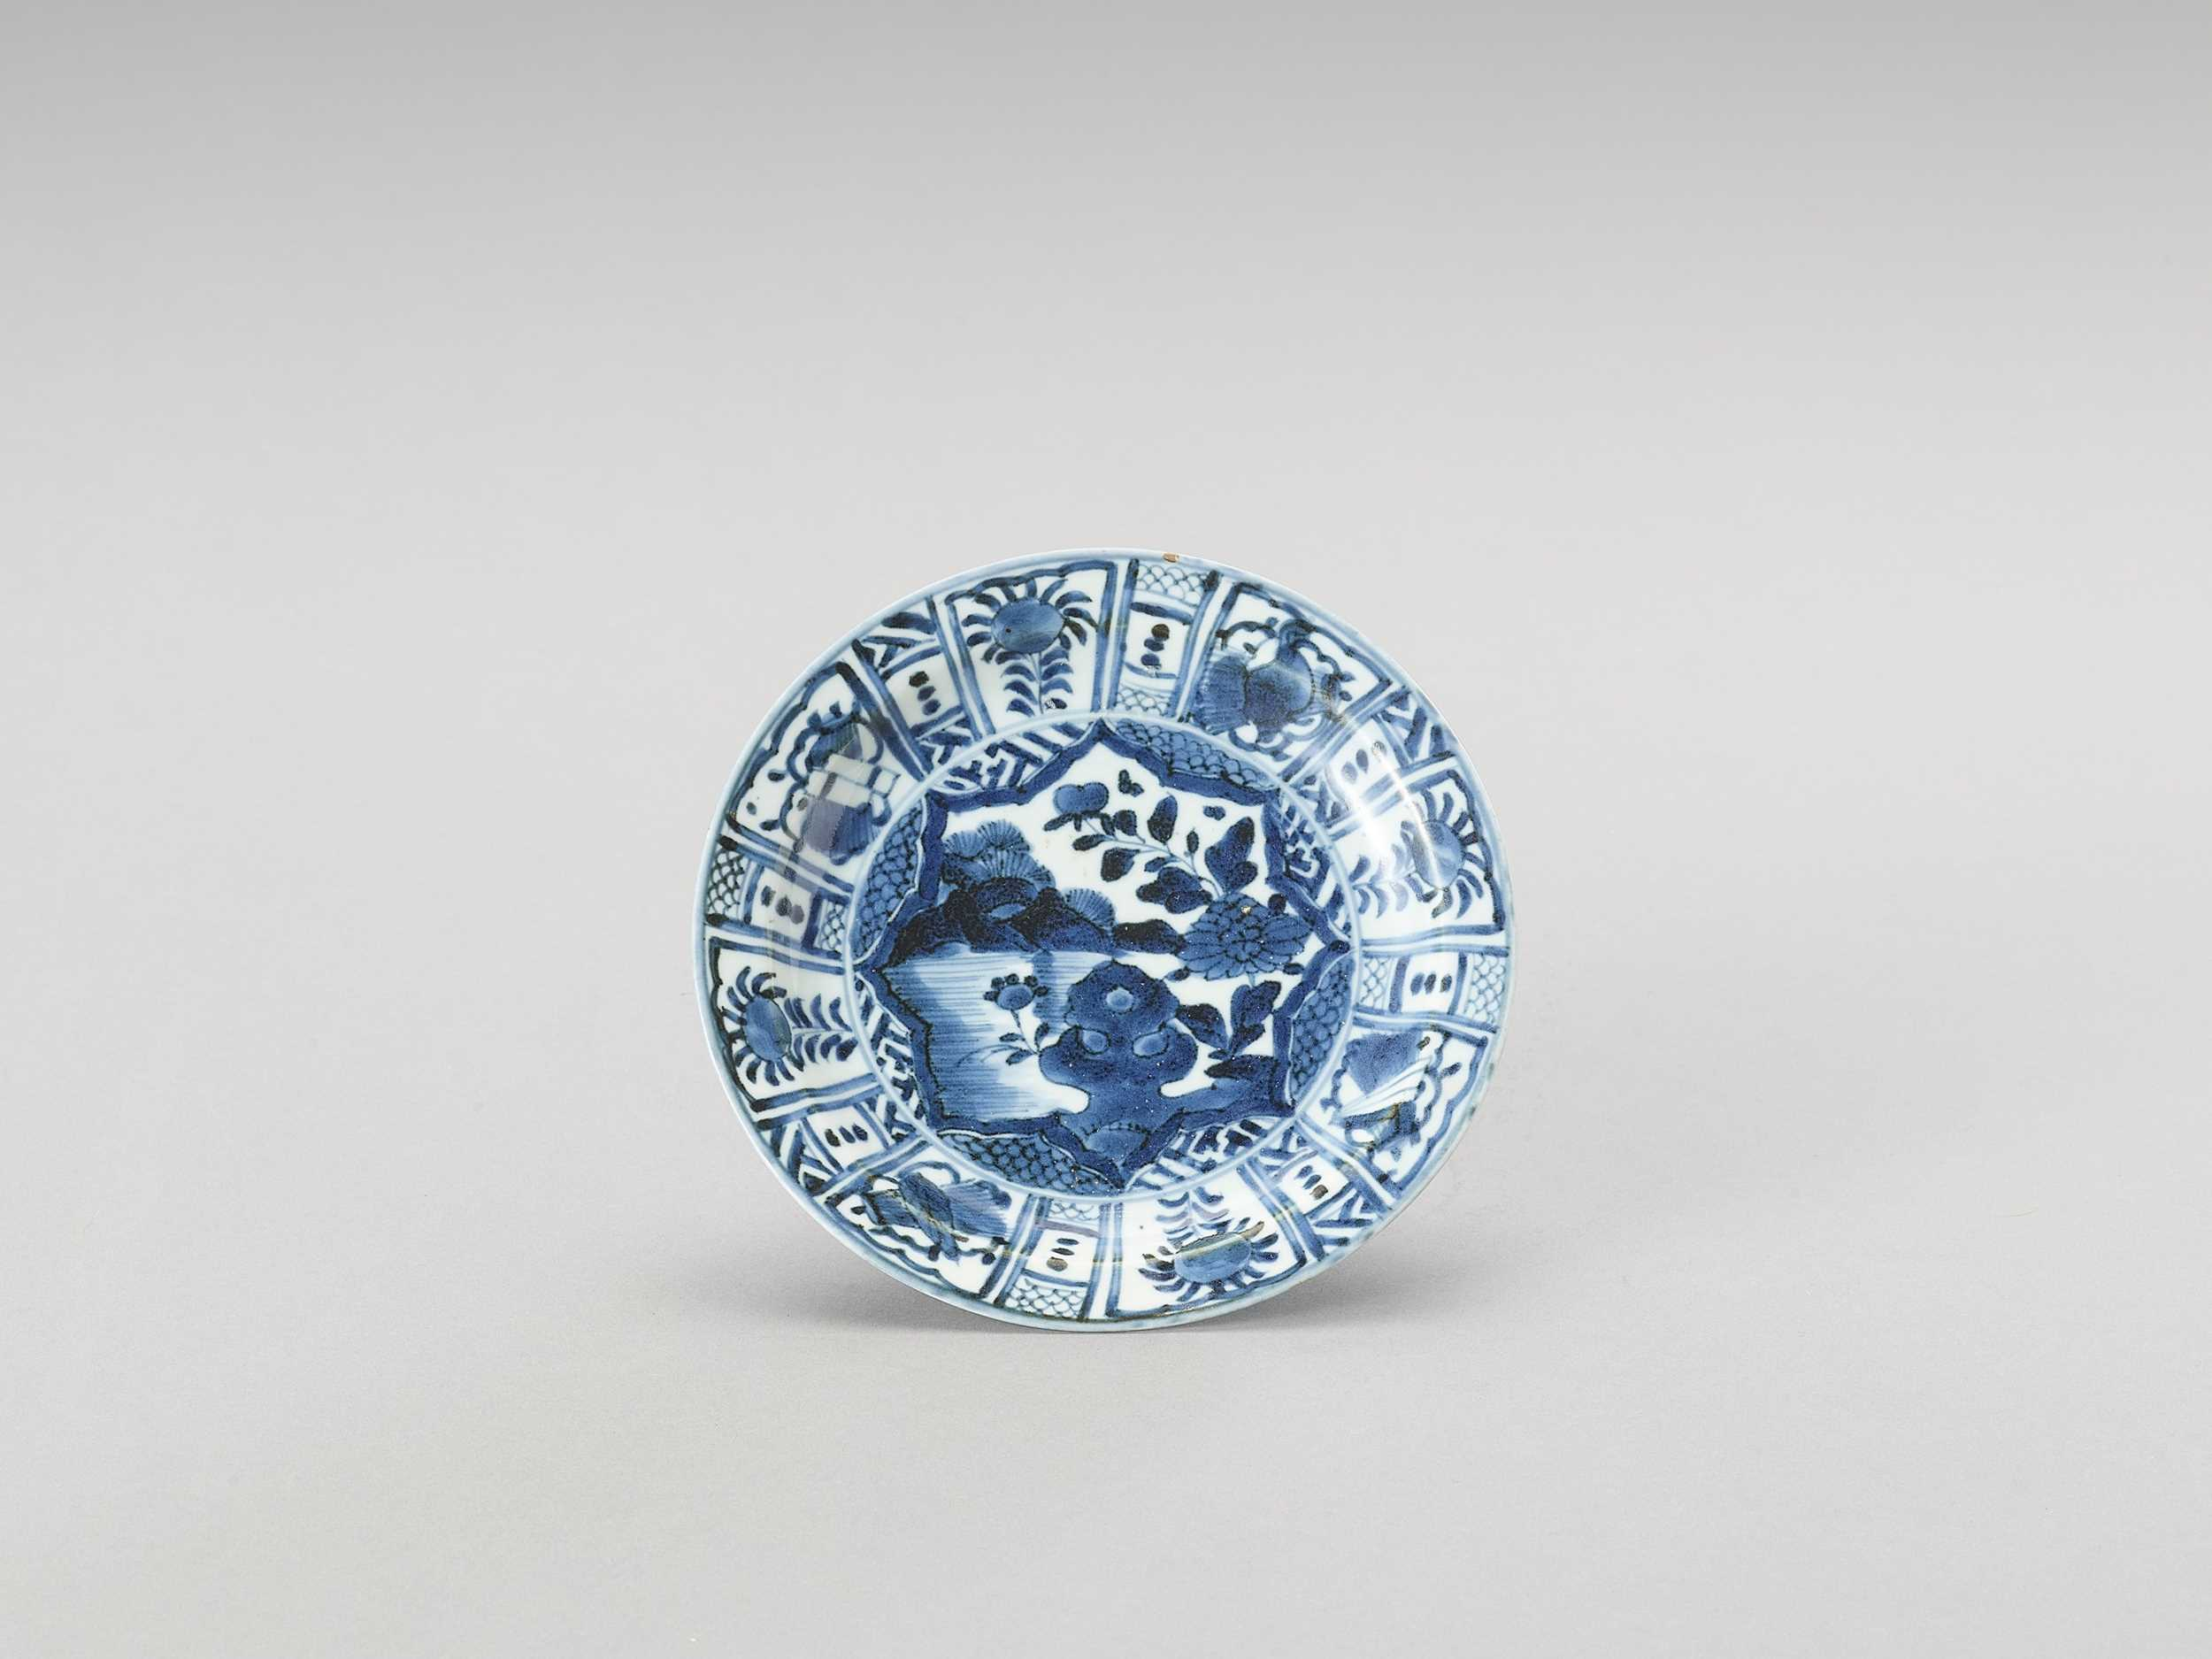 Lot 1023 - A BLUE AND WHITE ARITA PORCELAIN 'FLORAL' DISH